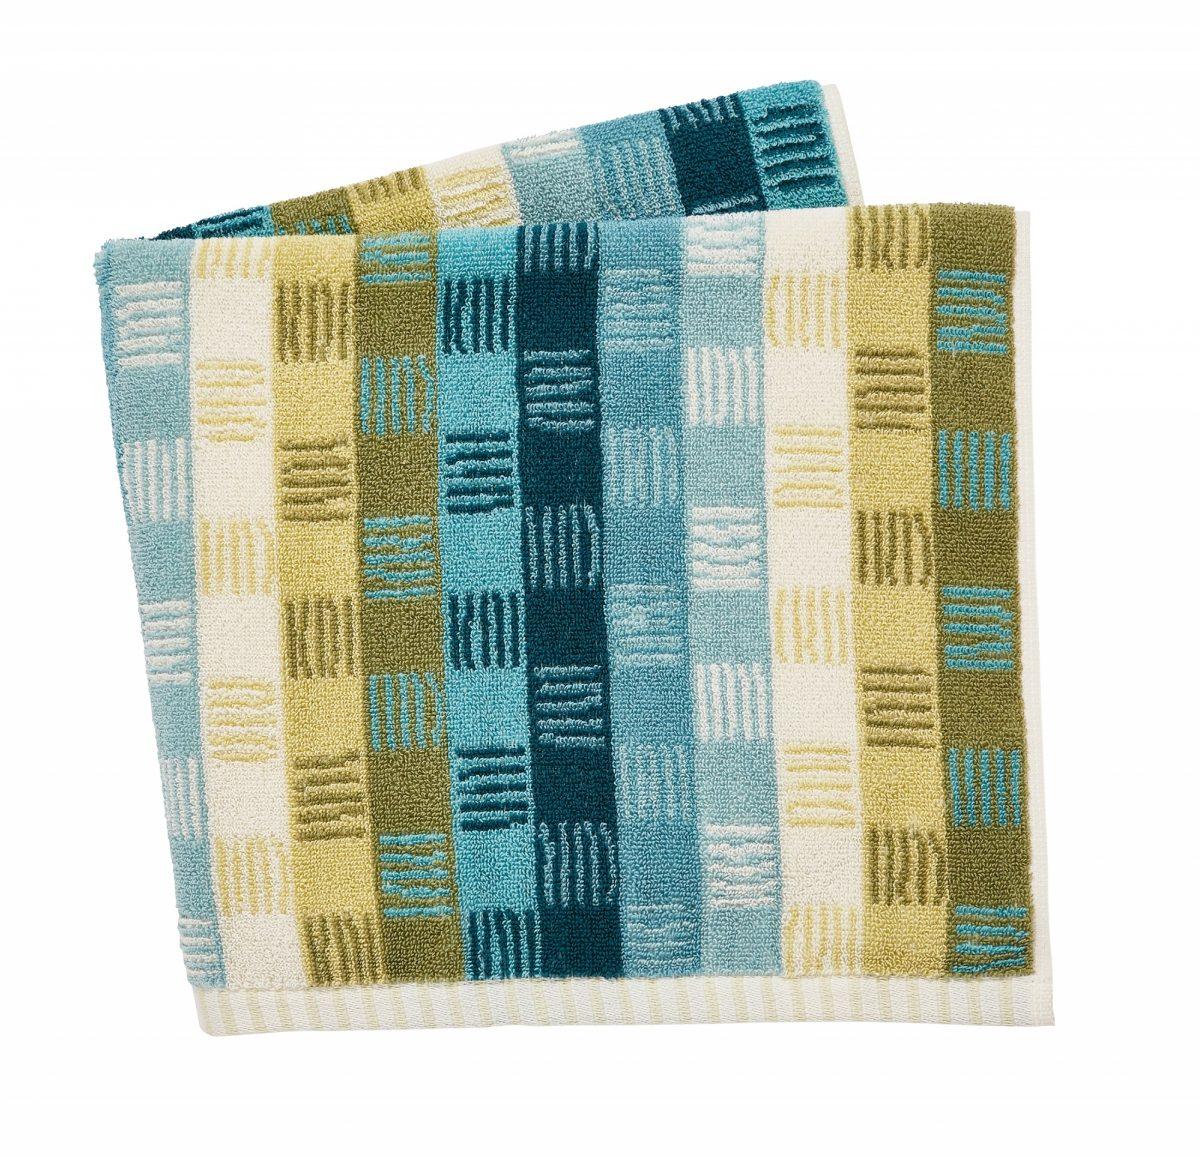 HS MODA Neroli towel folded co